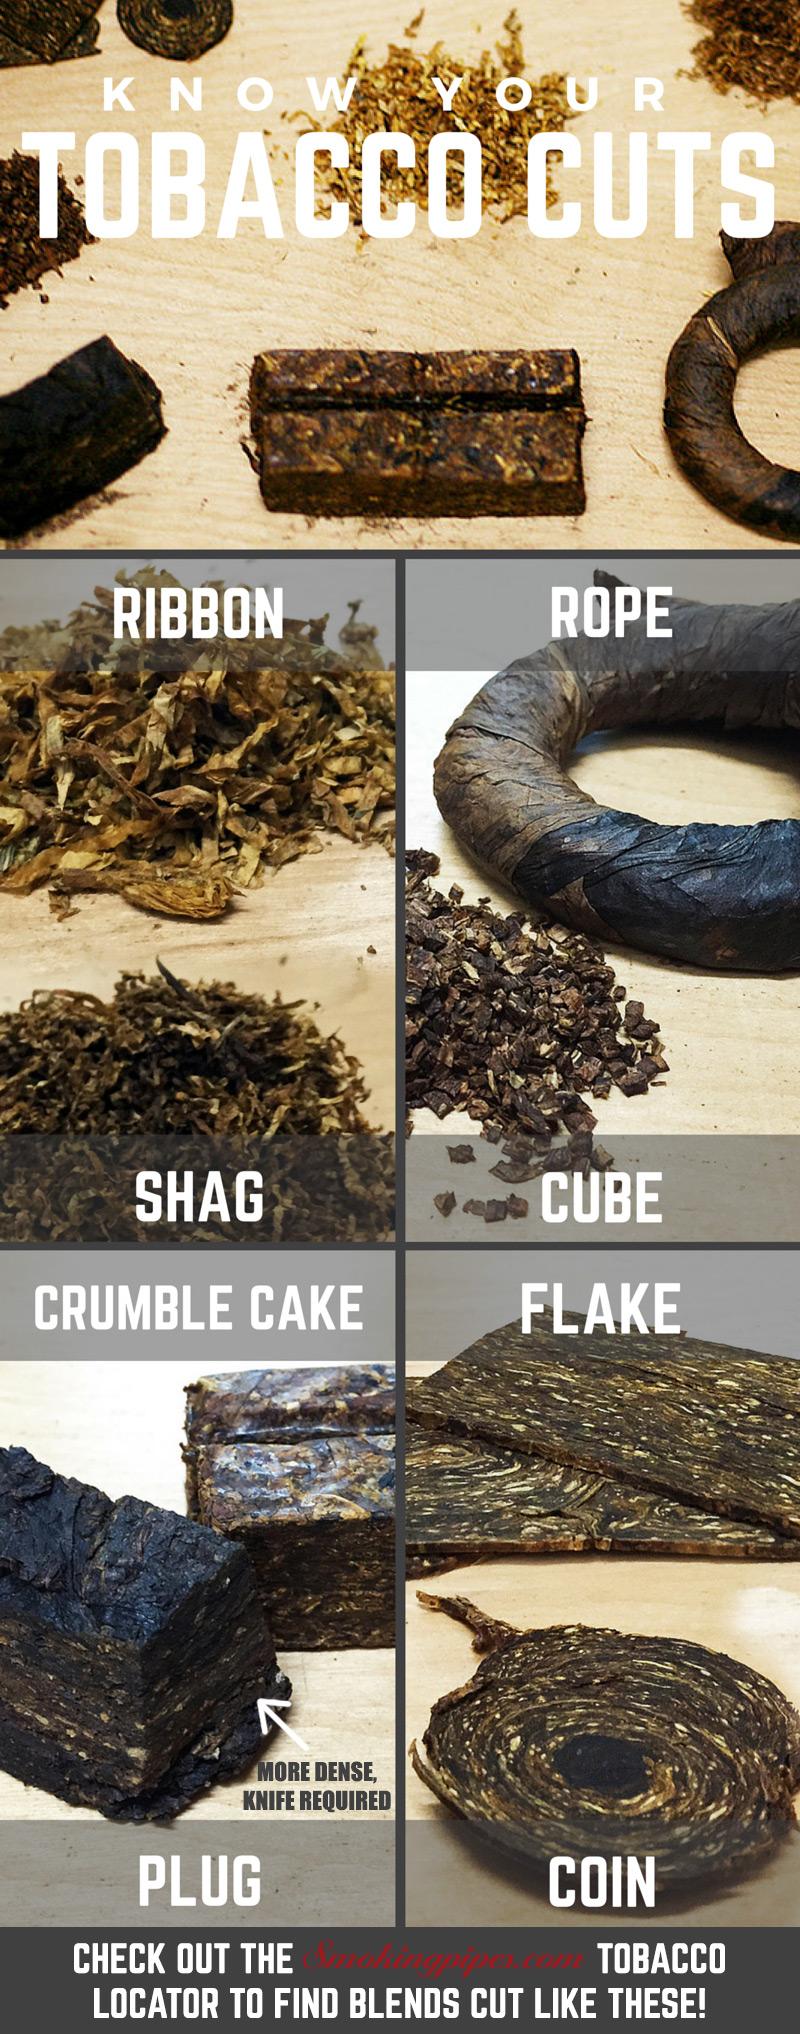 Types of Tobacco Cuts at Smokingpipes.com & smokingpipes.com | Pipe Tobacco